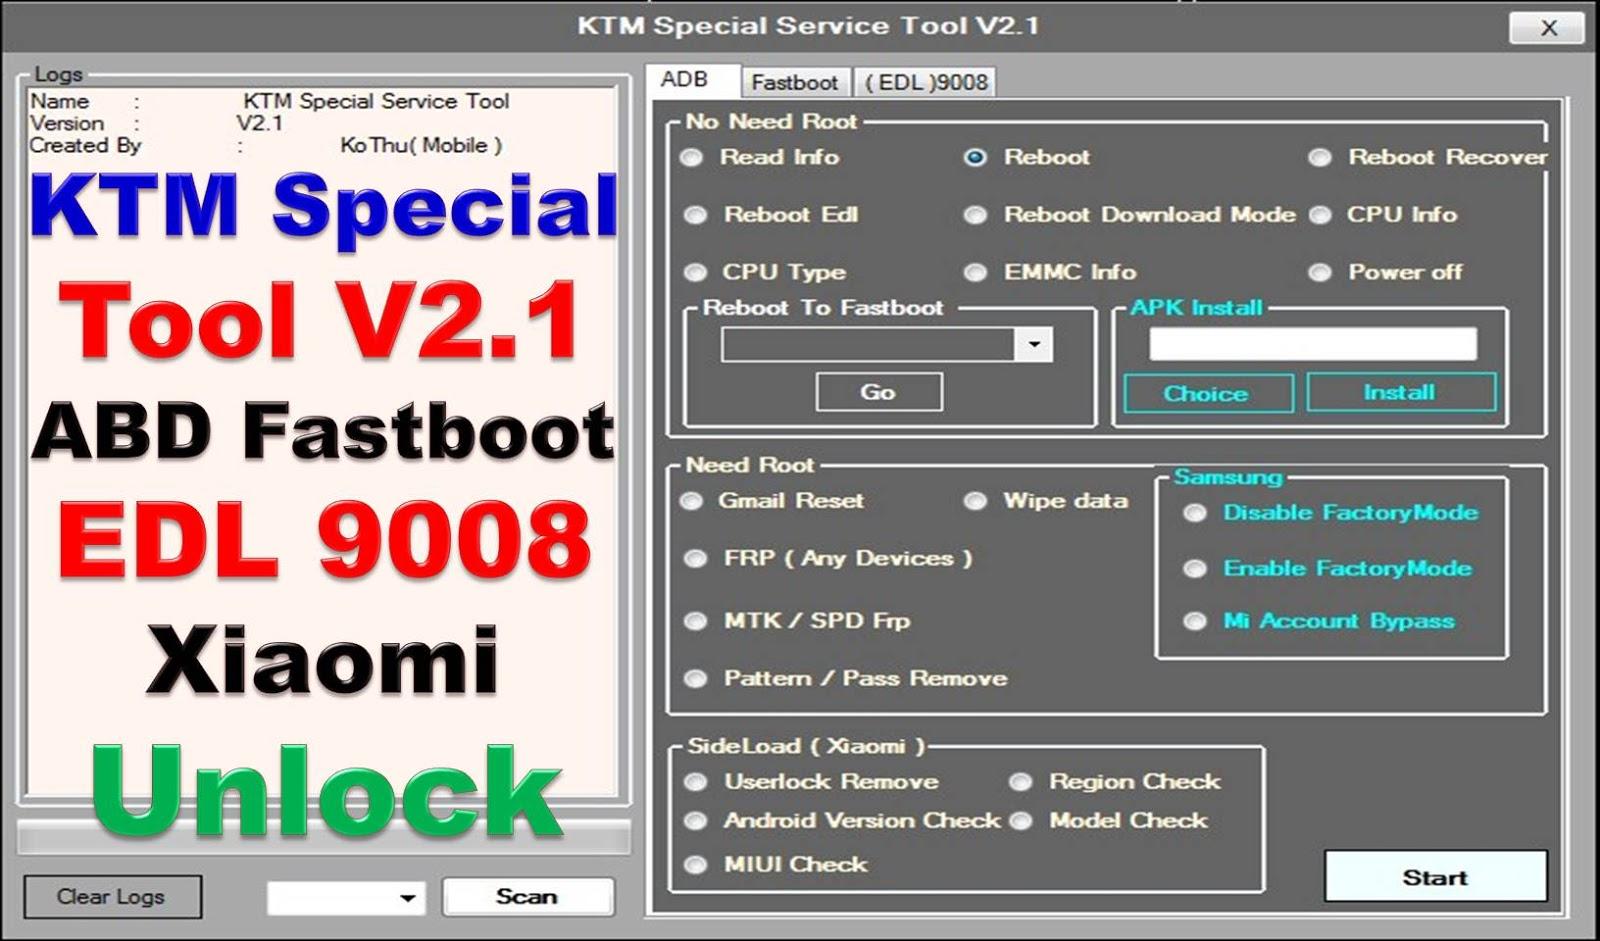 KTM Special Service Tool V1 2 Fastboot ADB EDL9008 Xiaomi